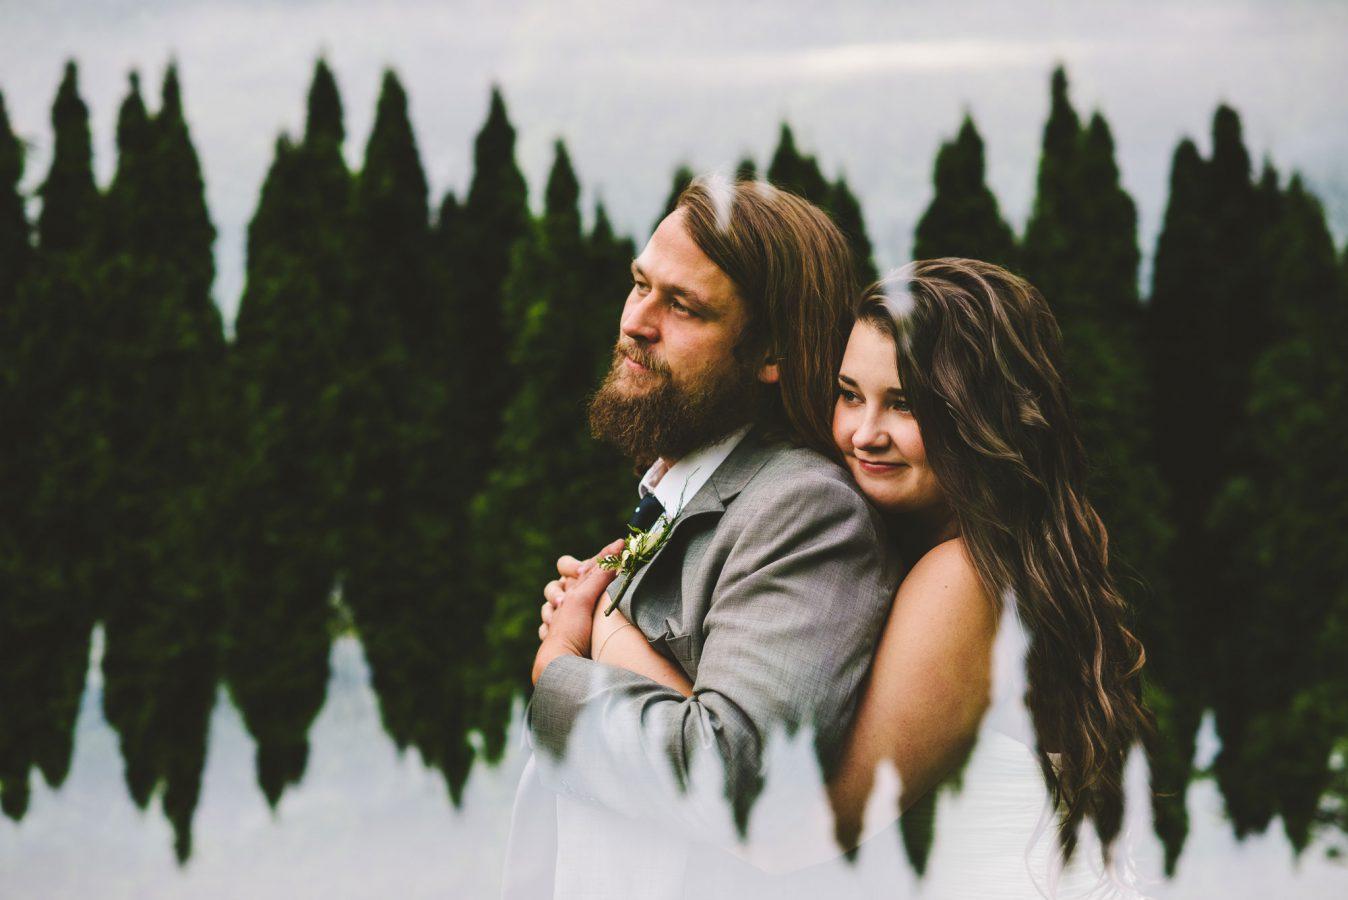 fete-photography-weddings-2017-011